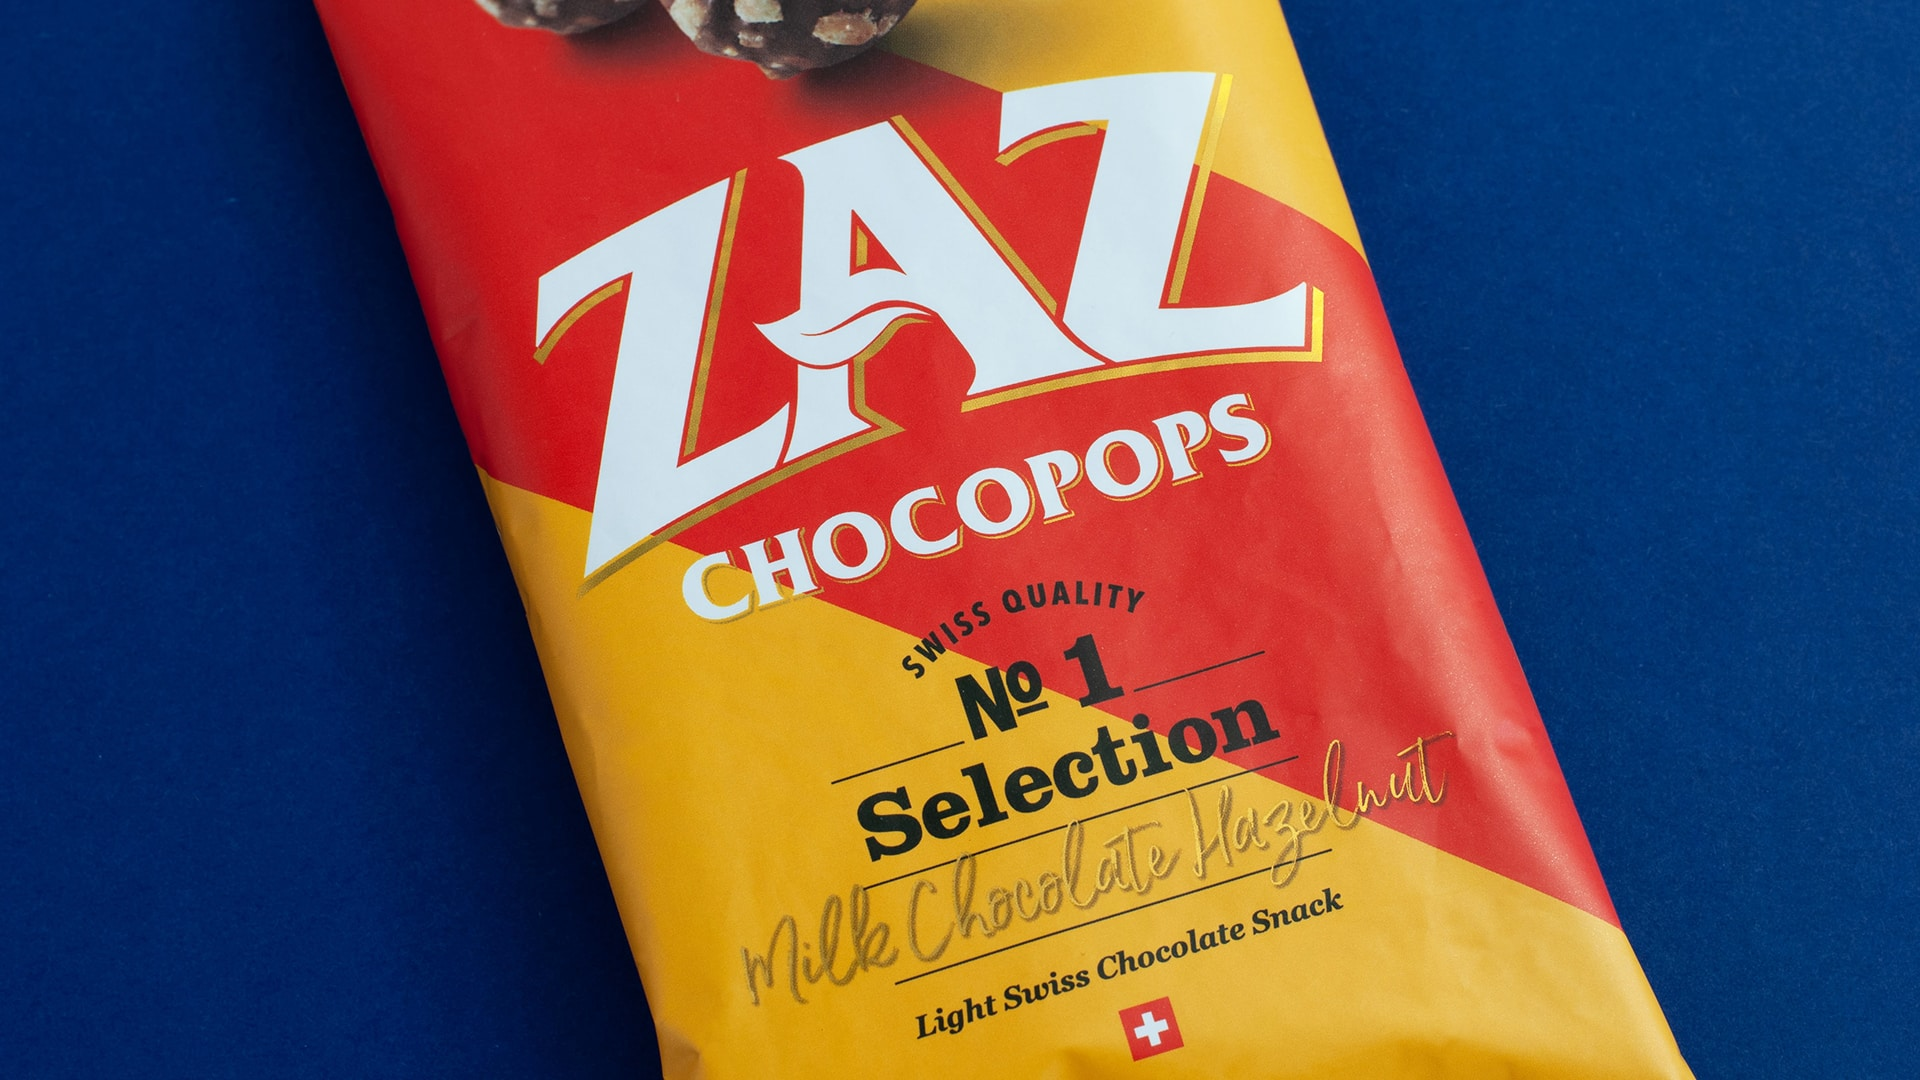 Zaz-branding-and-packaging-design-hero